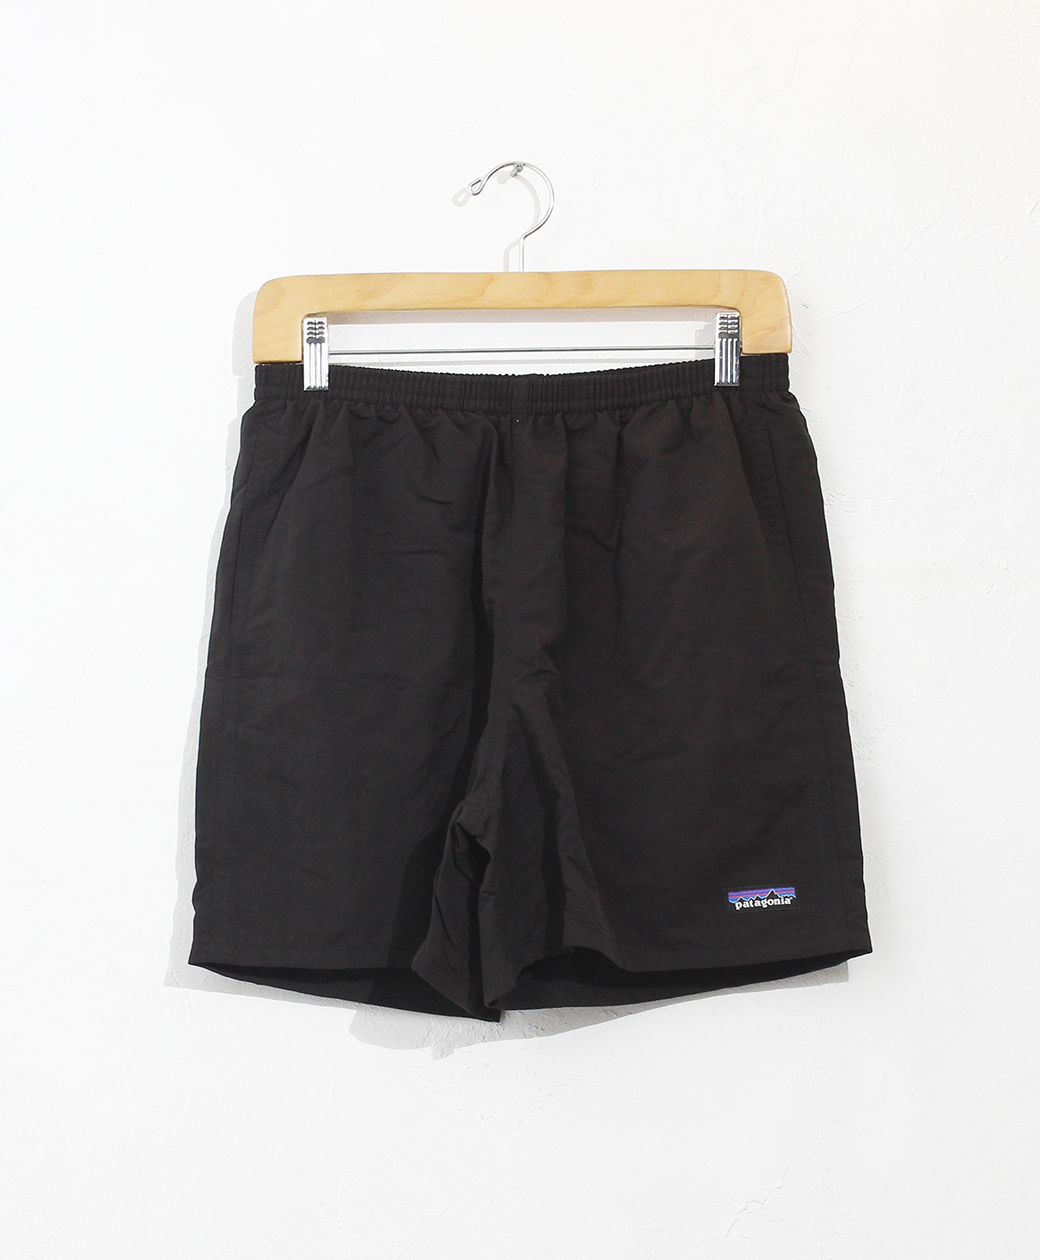 patagonia M's Baggies Shorts 5(BLK)